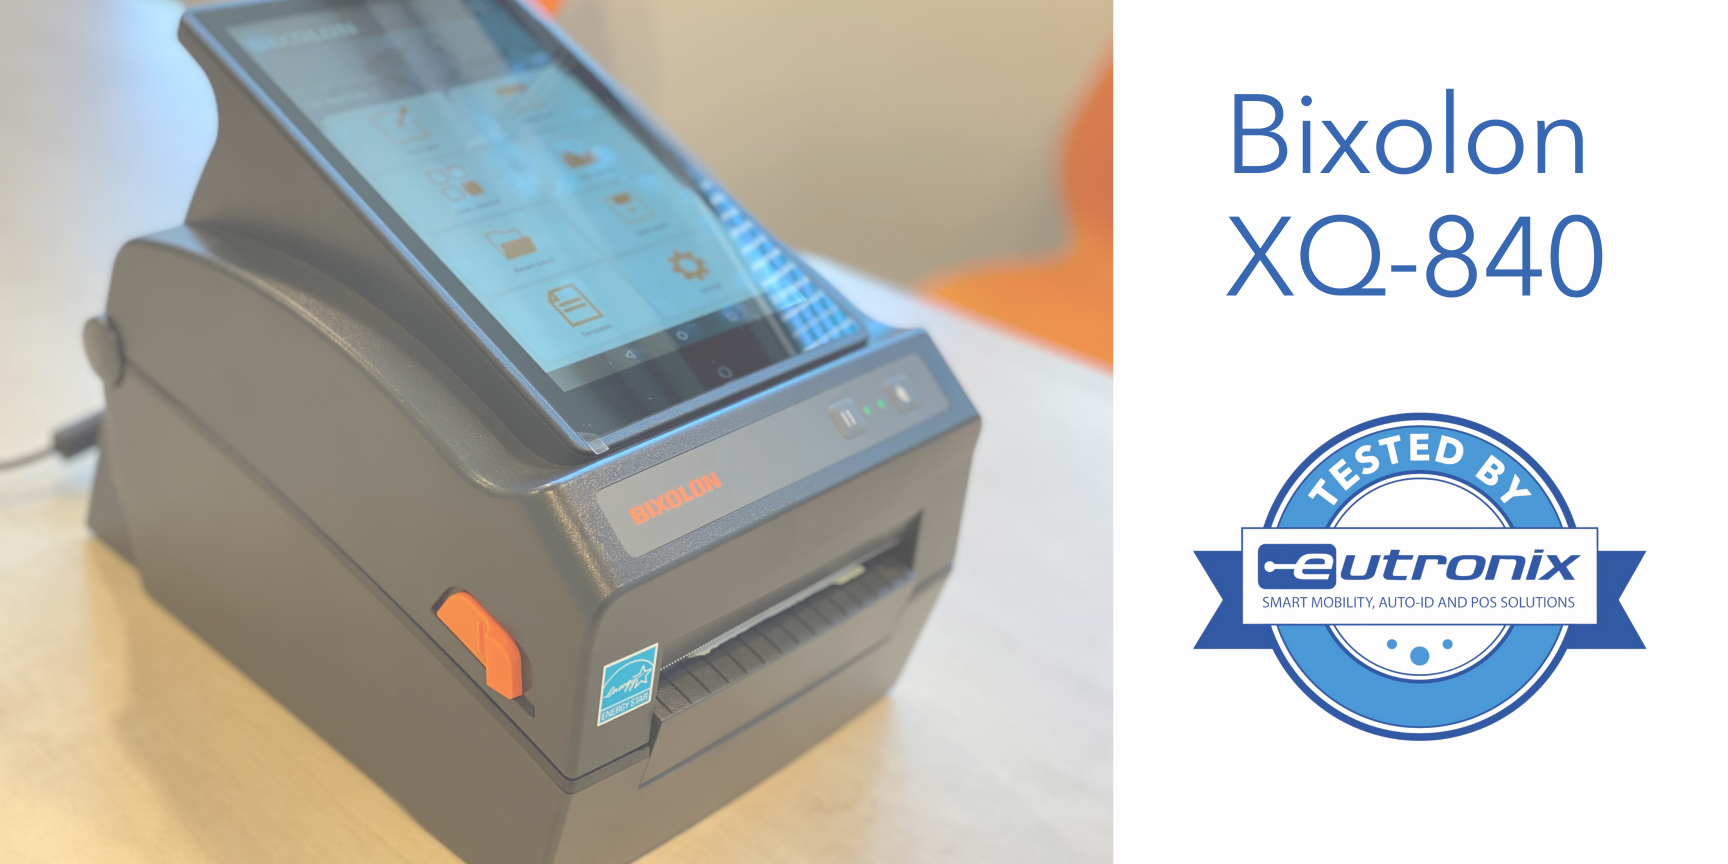 Eutronix - Bixolon XQ-840